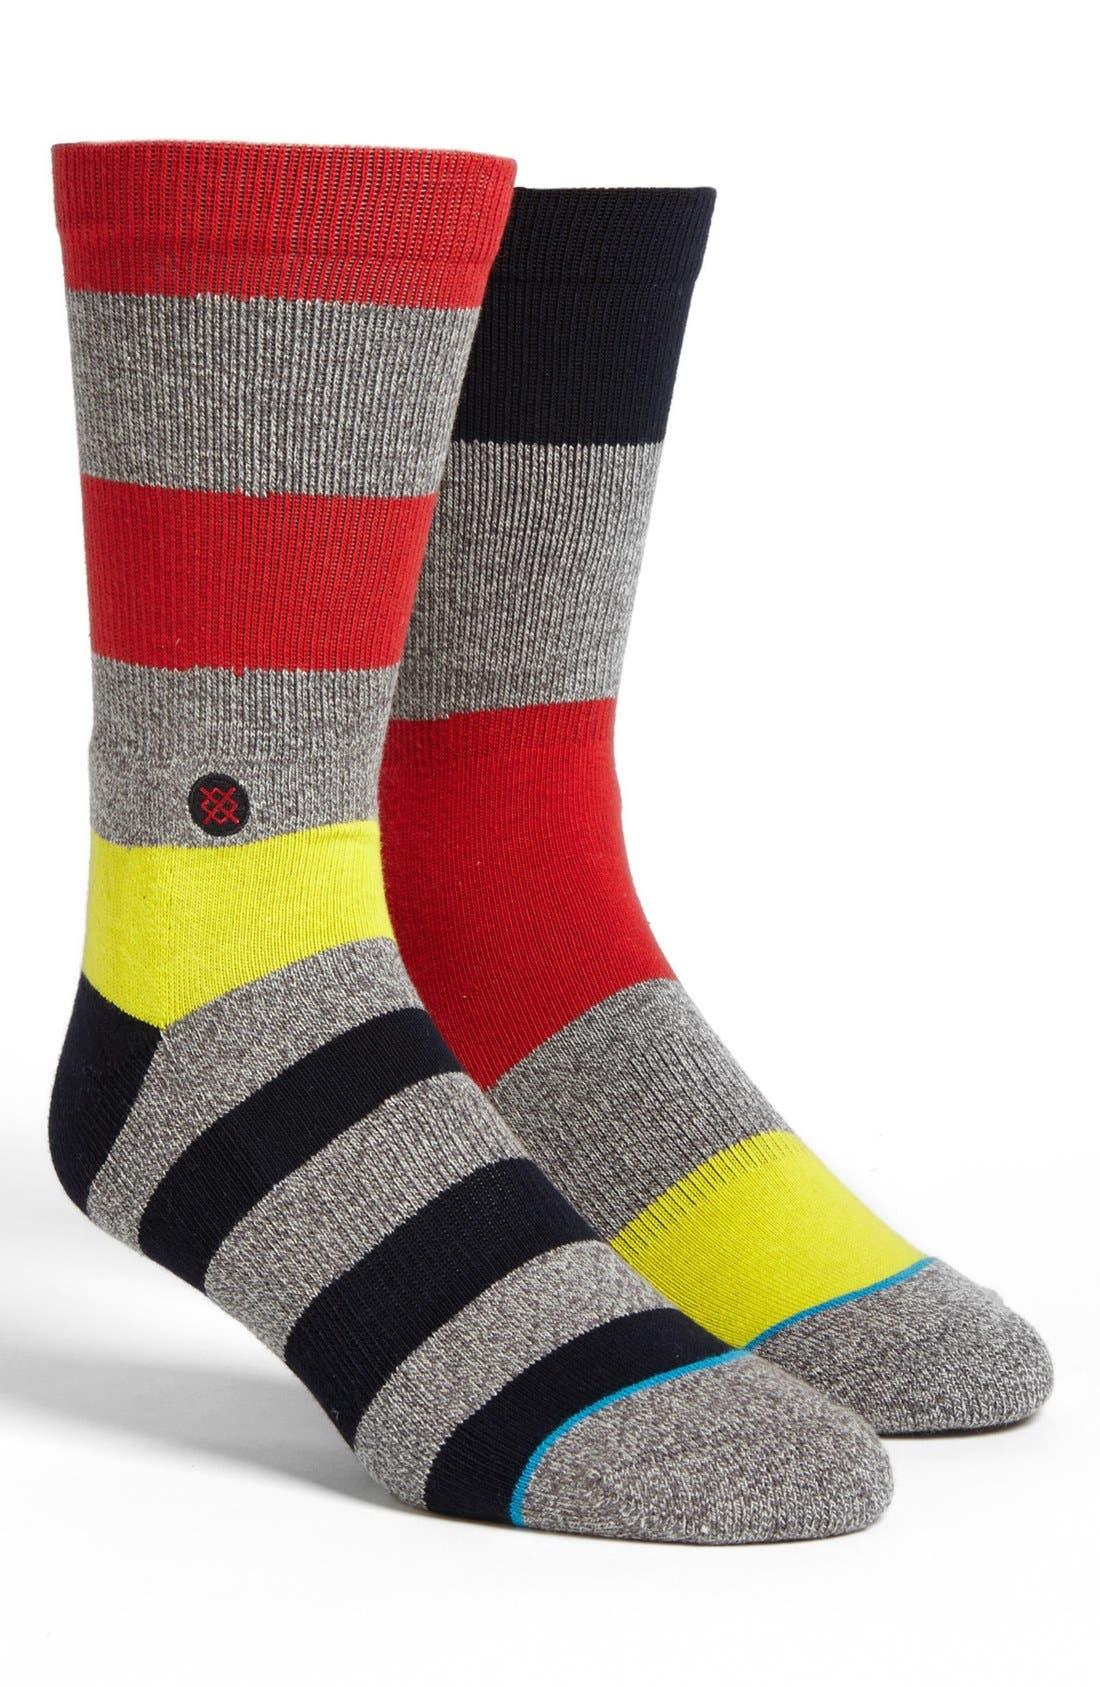 Alternate Image 1 Selected - Stance 'Galley' Socks